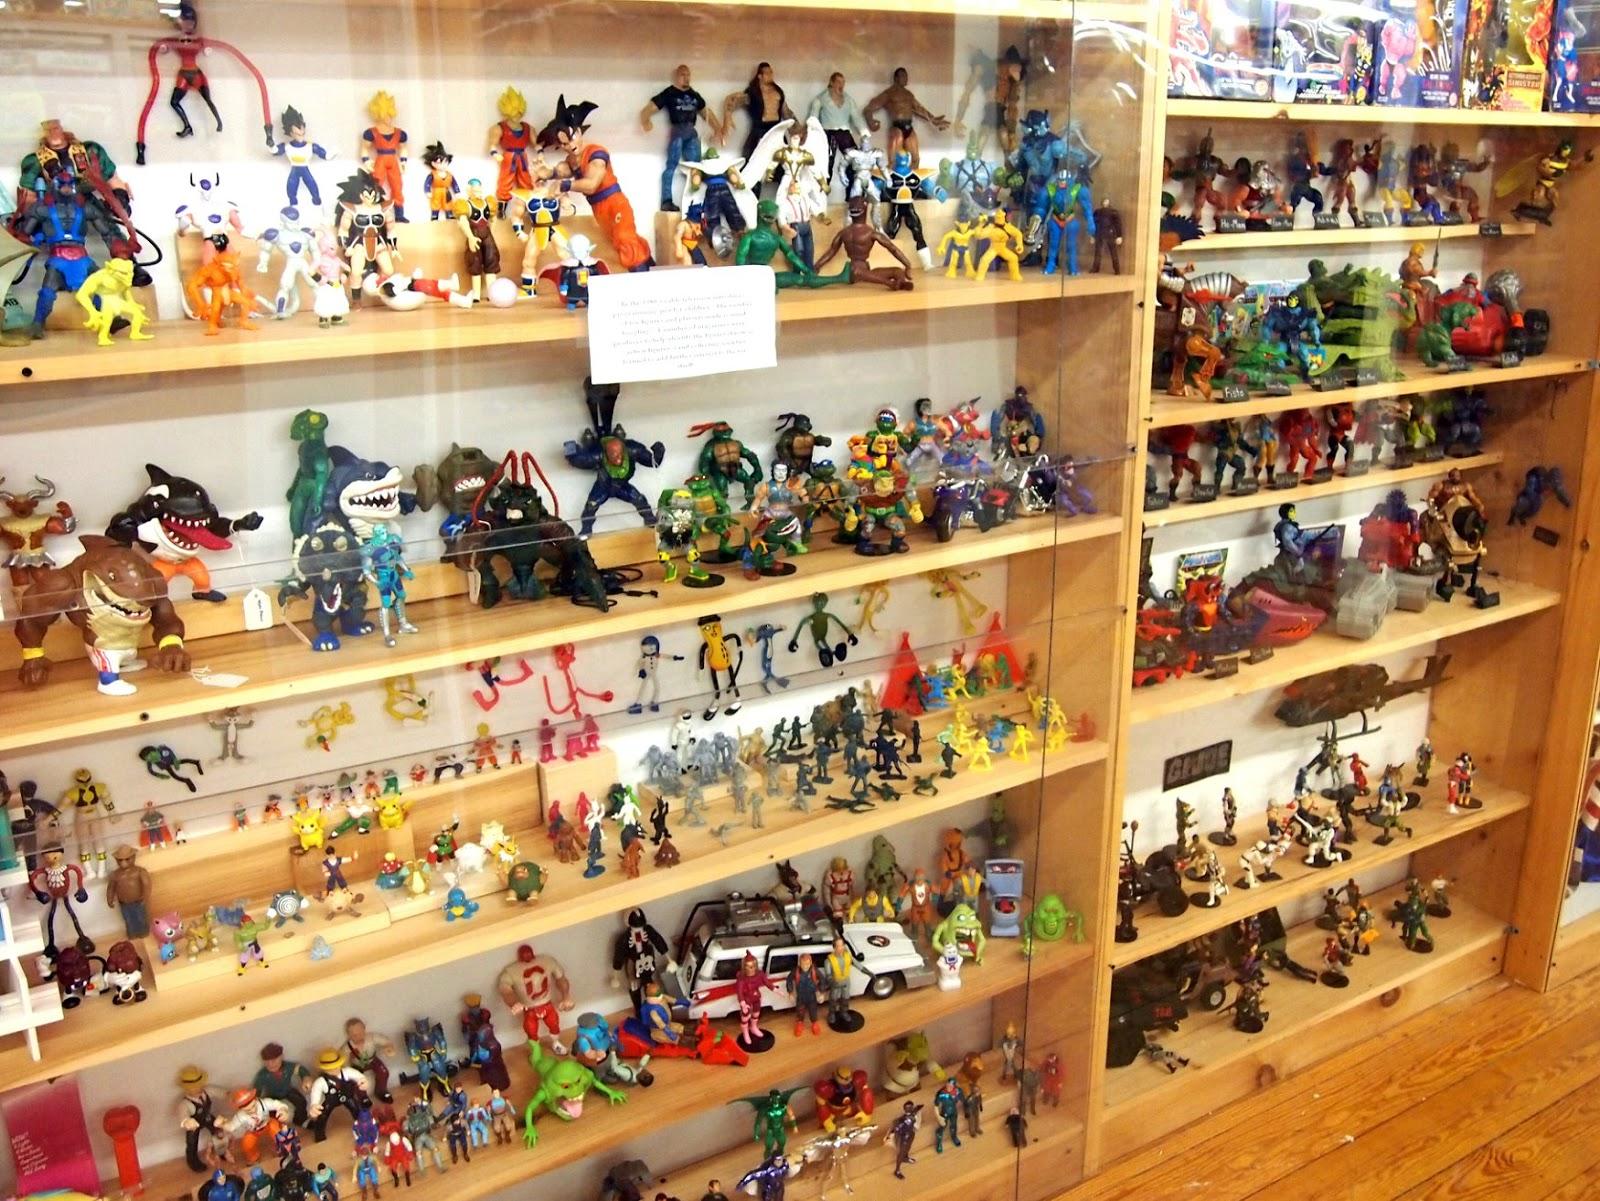 80 Toy Action Figure Shelves - Vermont+Toy+Museum+3__OTIS_Cool 80 Toy Action Figure Shelves - Vermont+Toy+Museum+3__OTIS  2018_911443.jpg